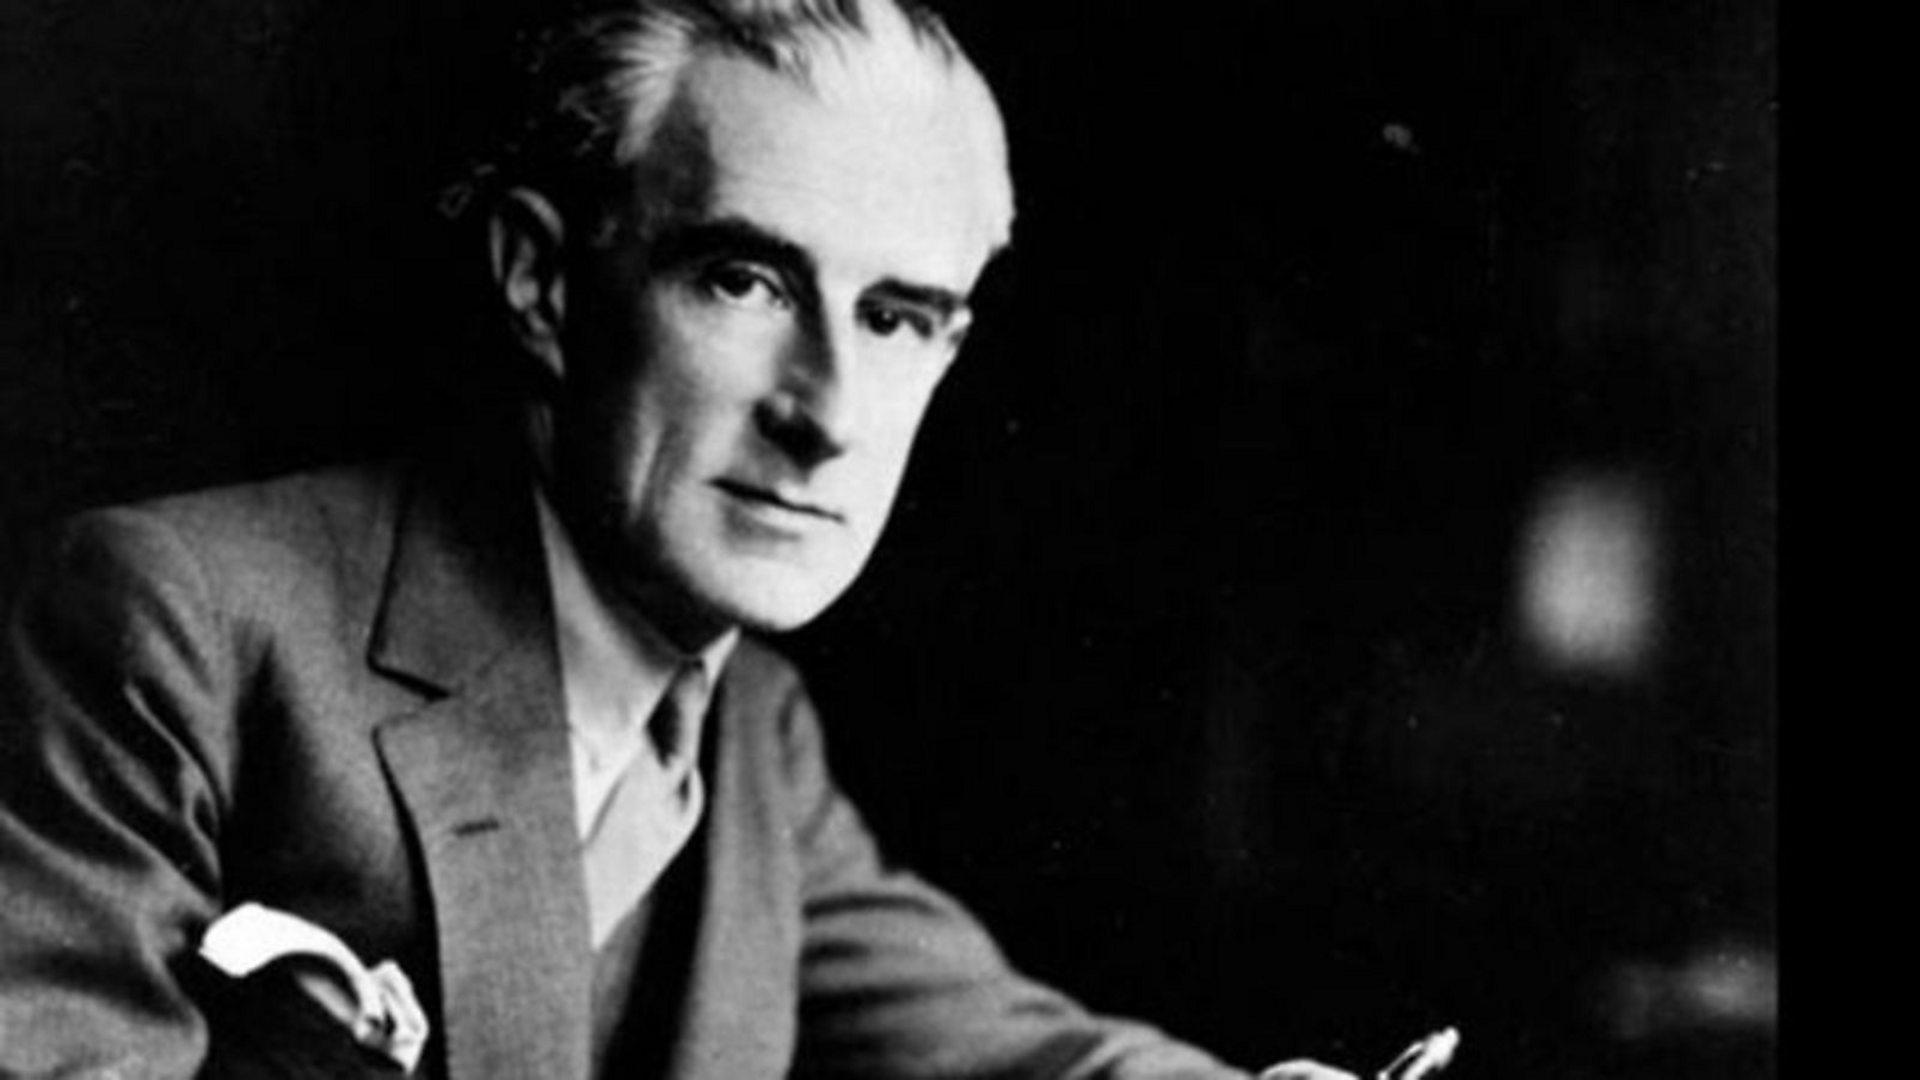 BBC Radio 3 - Composer of the Week, Maurice Ravel (1875-1937), Maurice Ravel